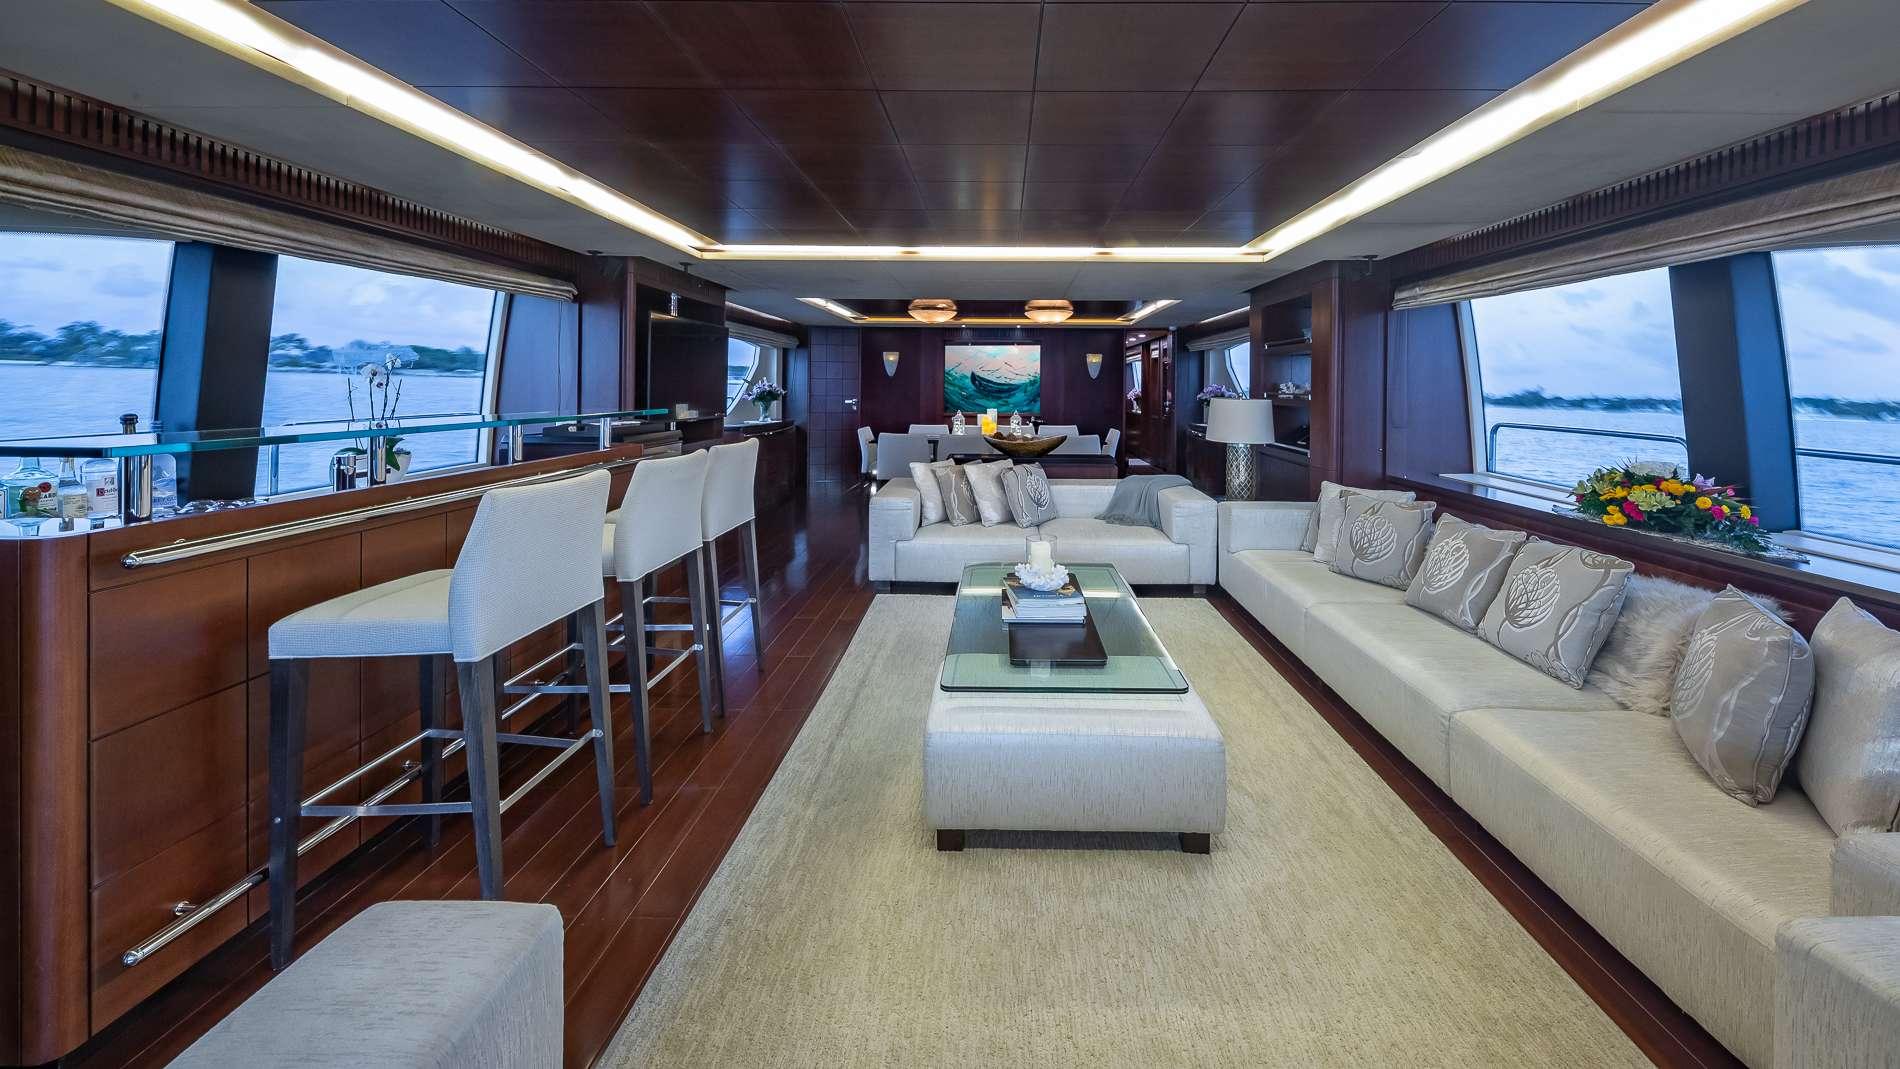 Motor Yacht 'TAIL LIGHTS' Salon Forward, 12 PAX, 6 Crew, 116.00 Ft, 35.00 Meters, Built 2011, Azimut, Refit Year 2016